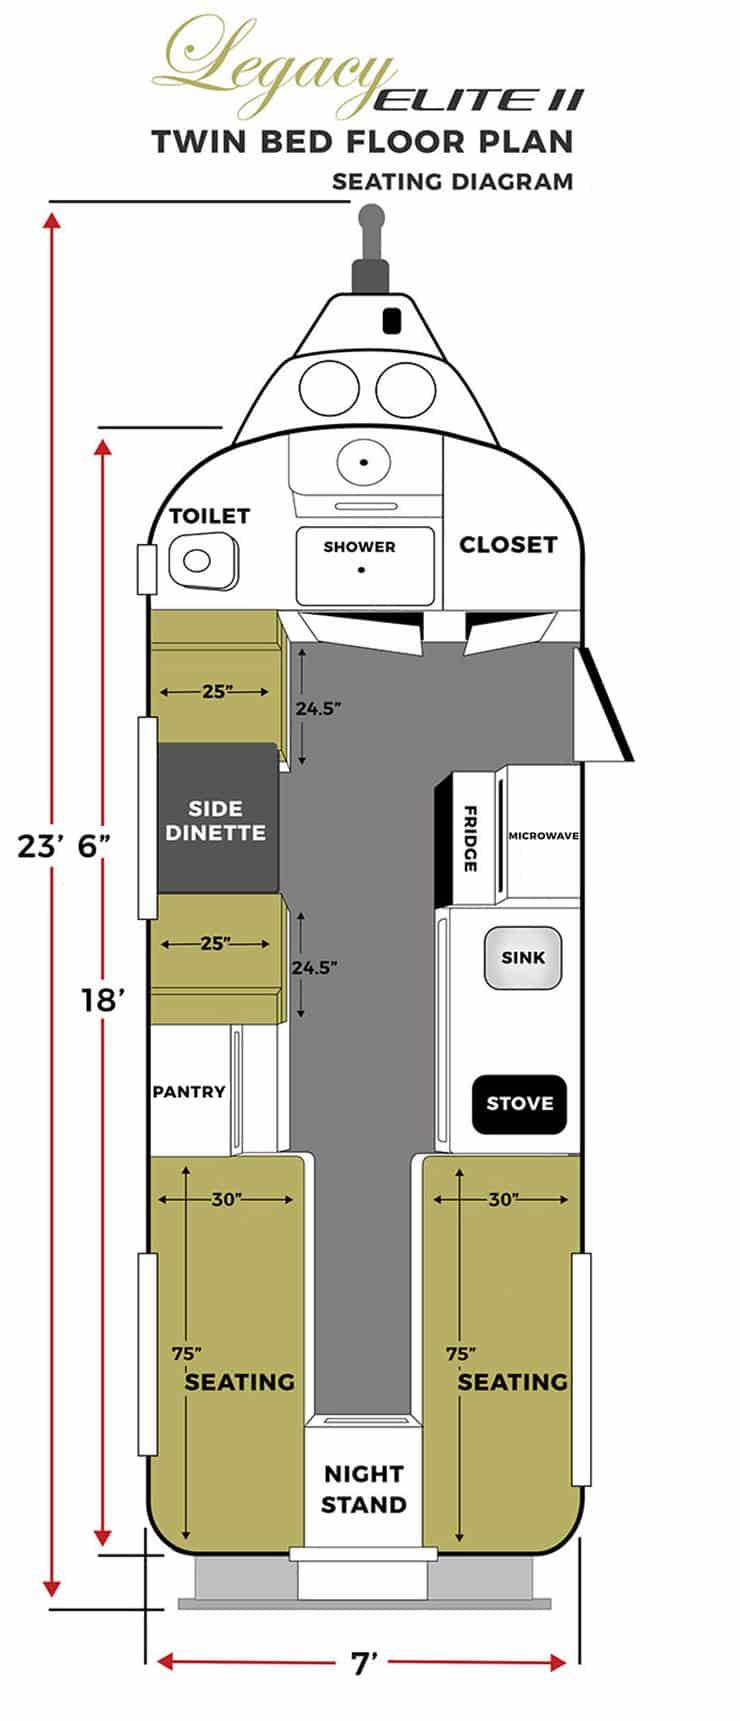 oliver travel trailers legacy elite 2 twin bed seating floor plan vertical